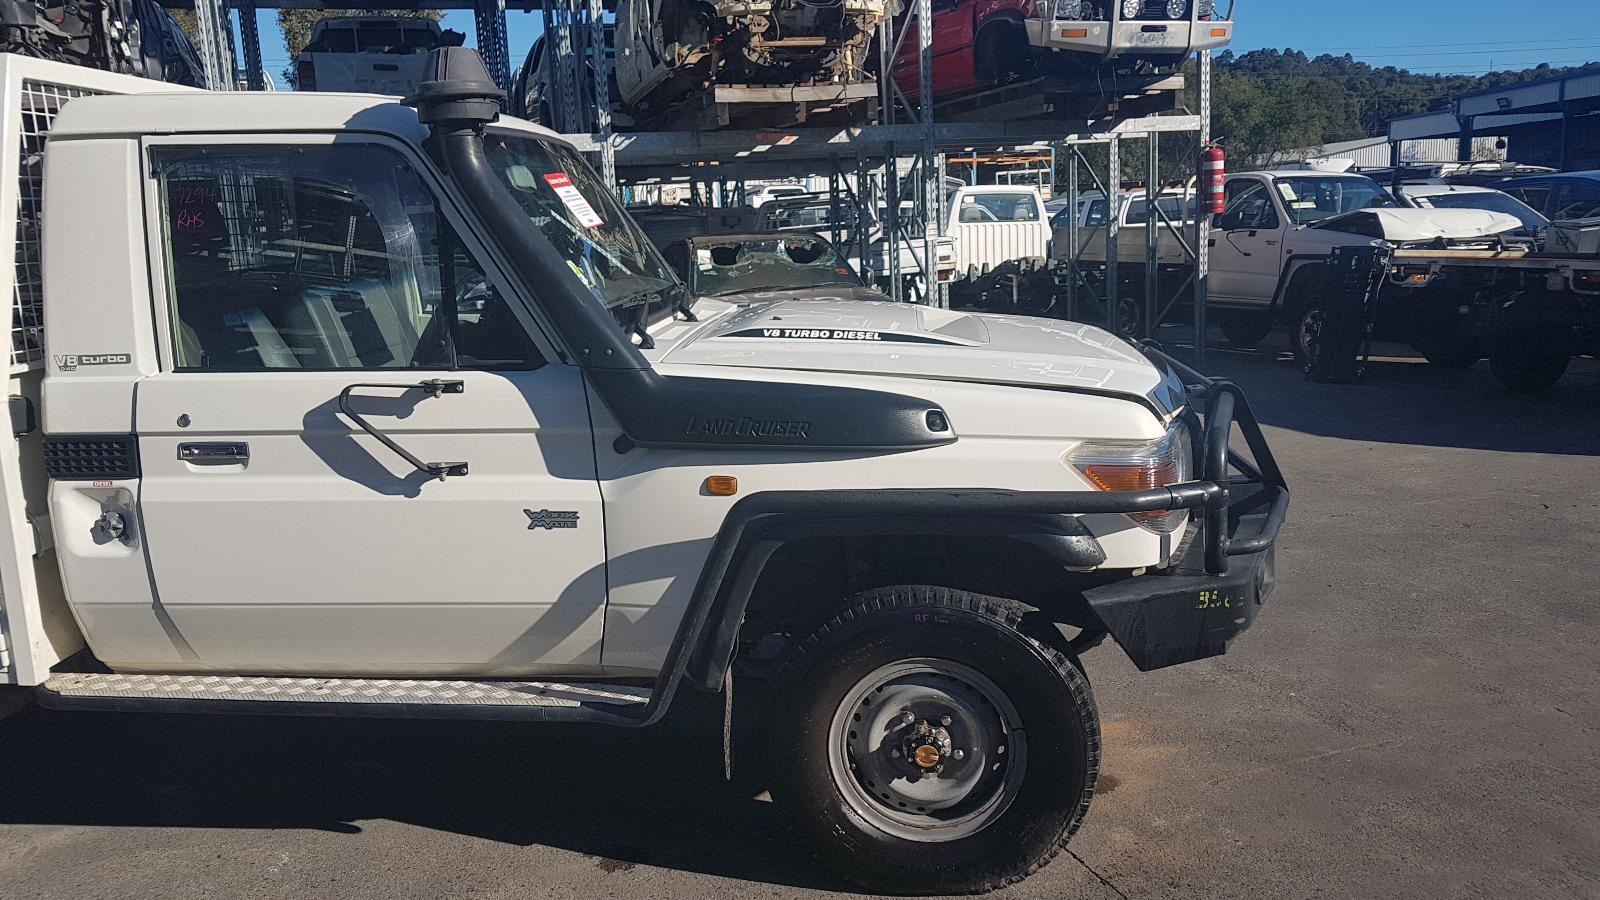 View Auto part Transfer Case Toyota Landcruiser 2014